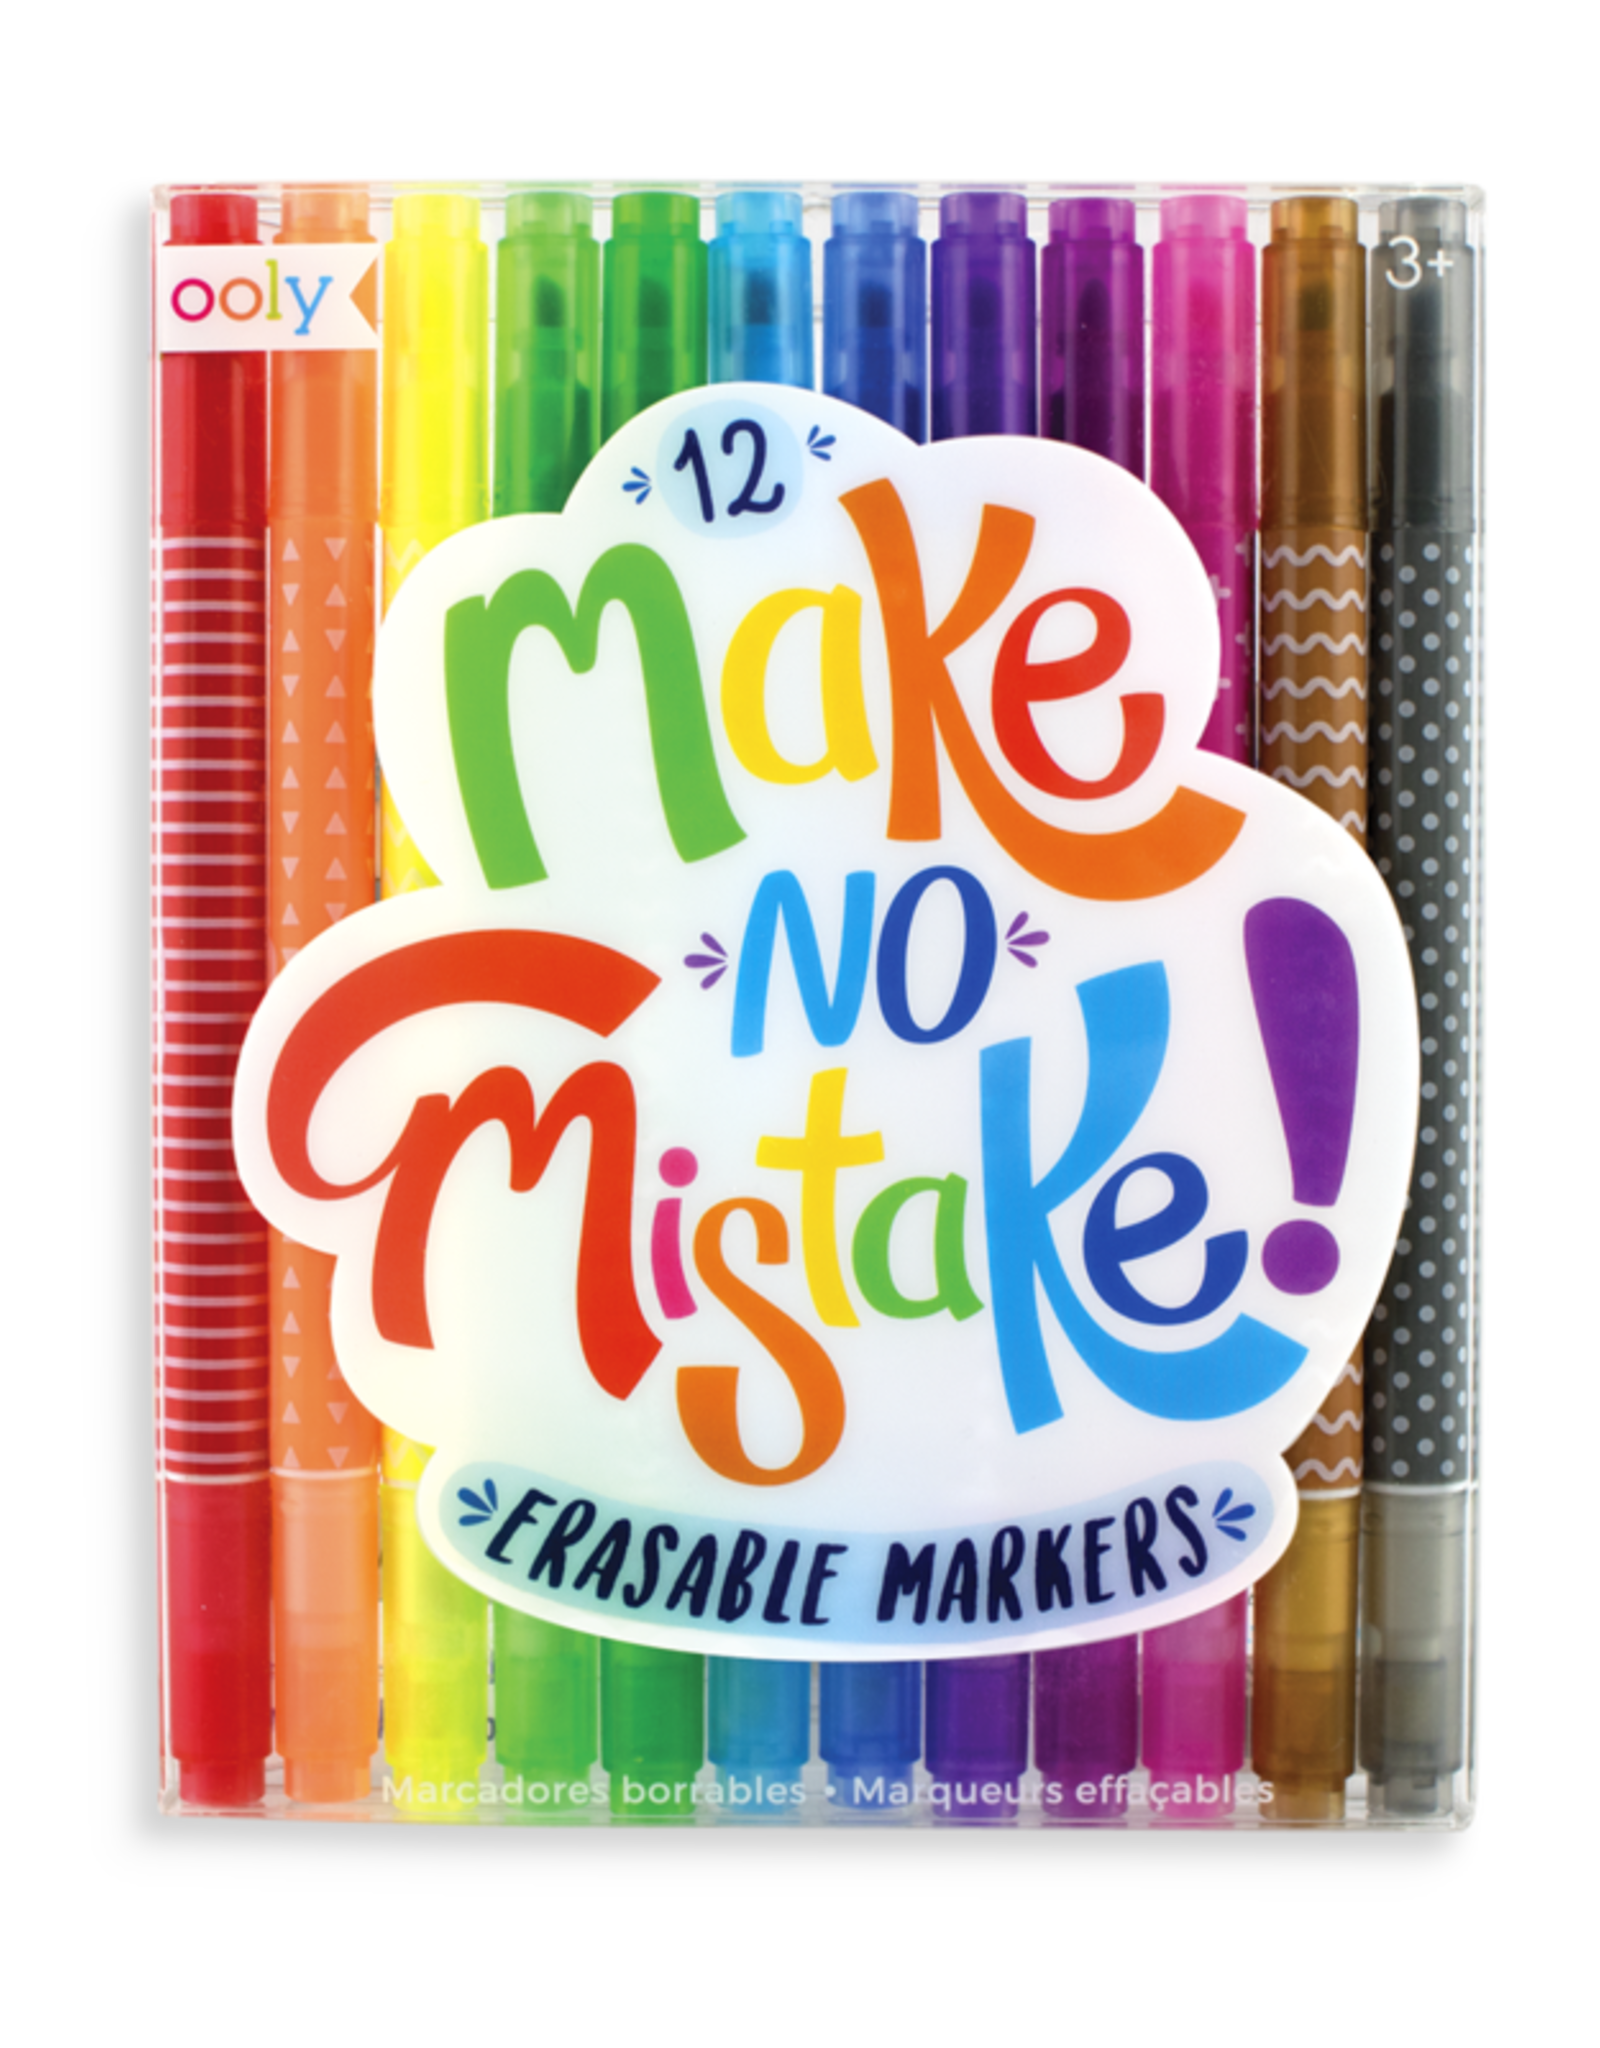 Ooly DBA International Arrivals Make No Mistake Erasable Markers - Set of 12